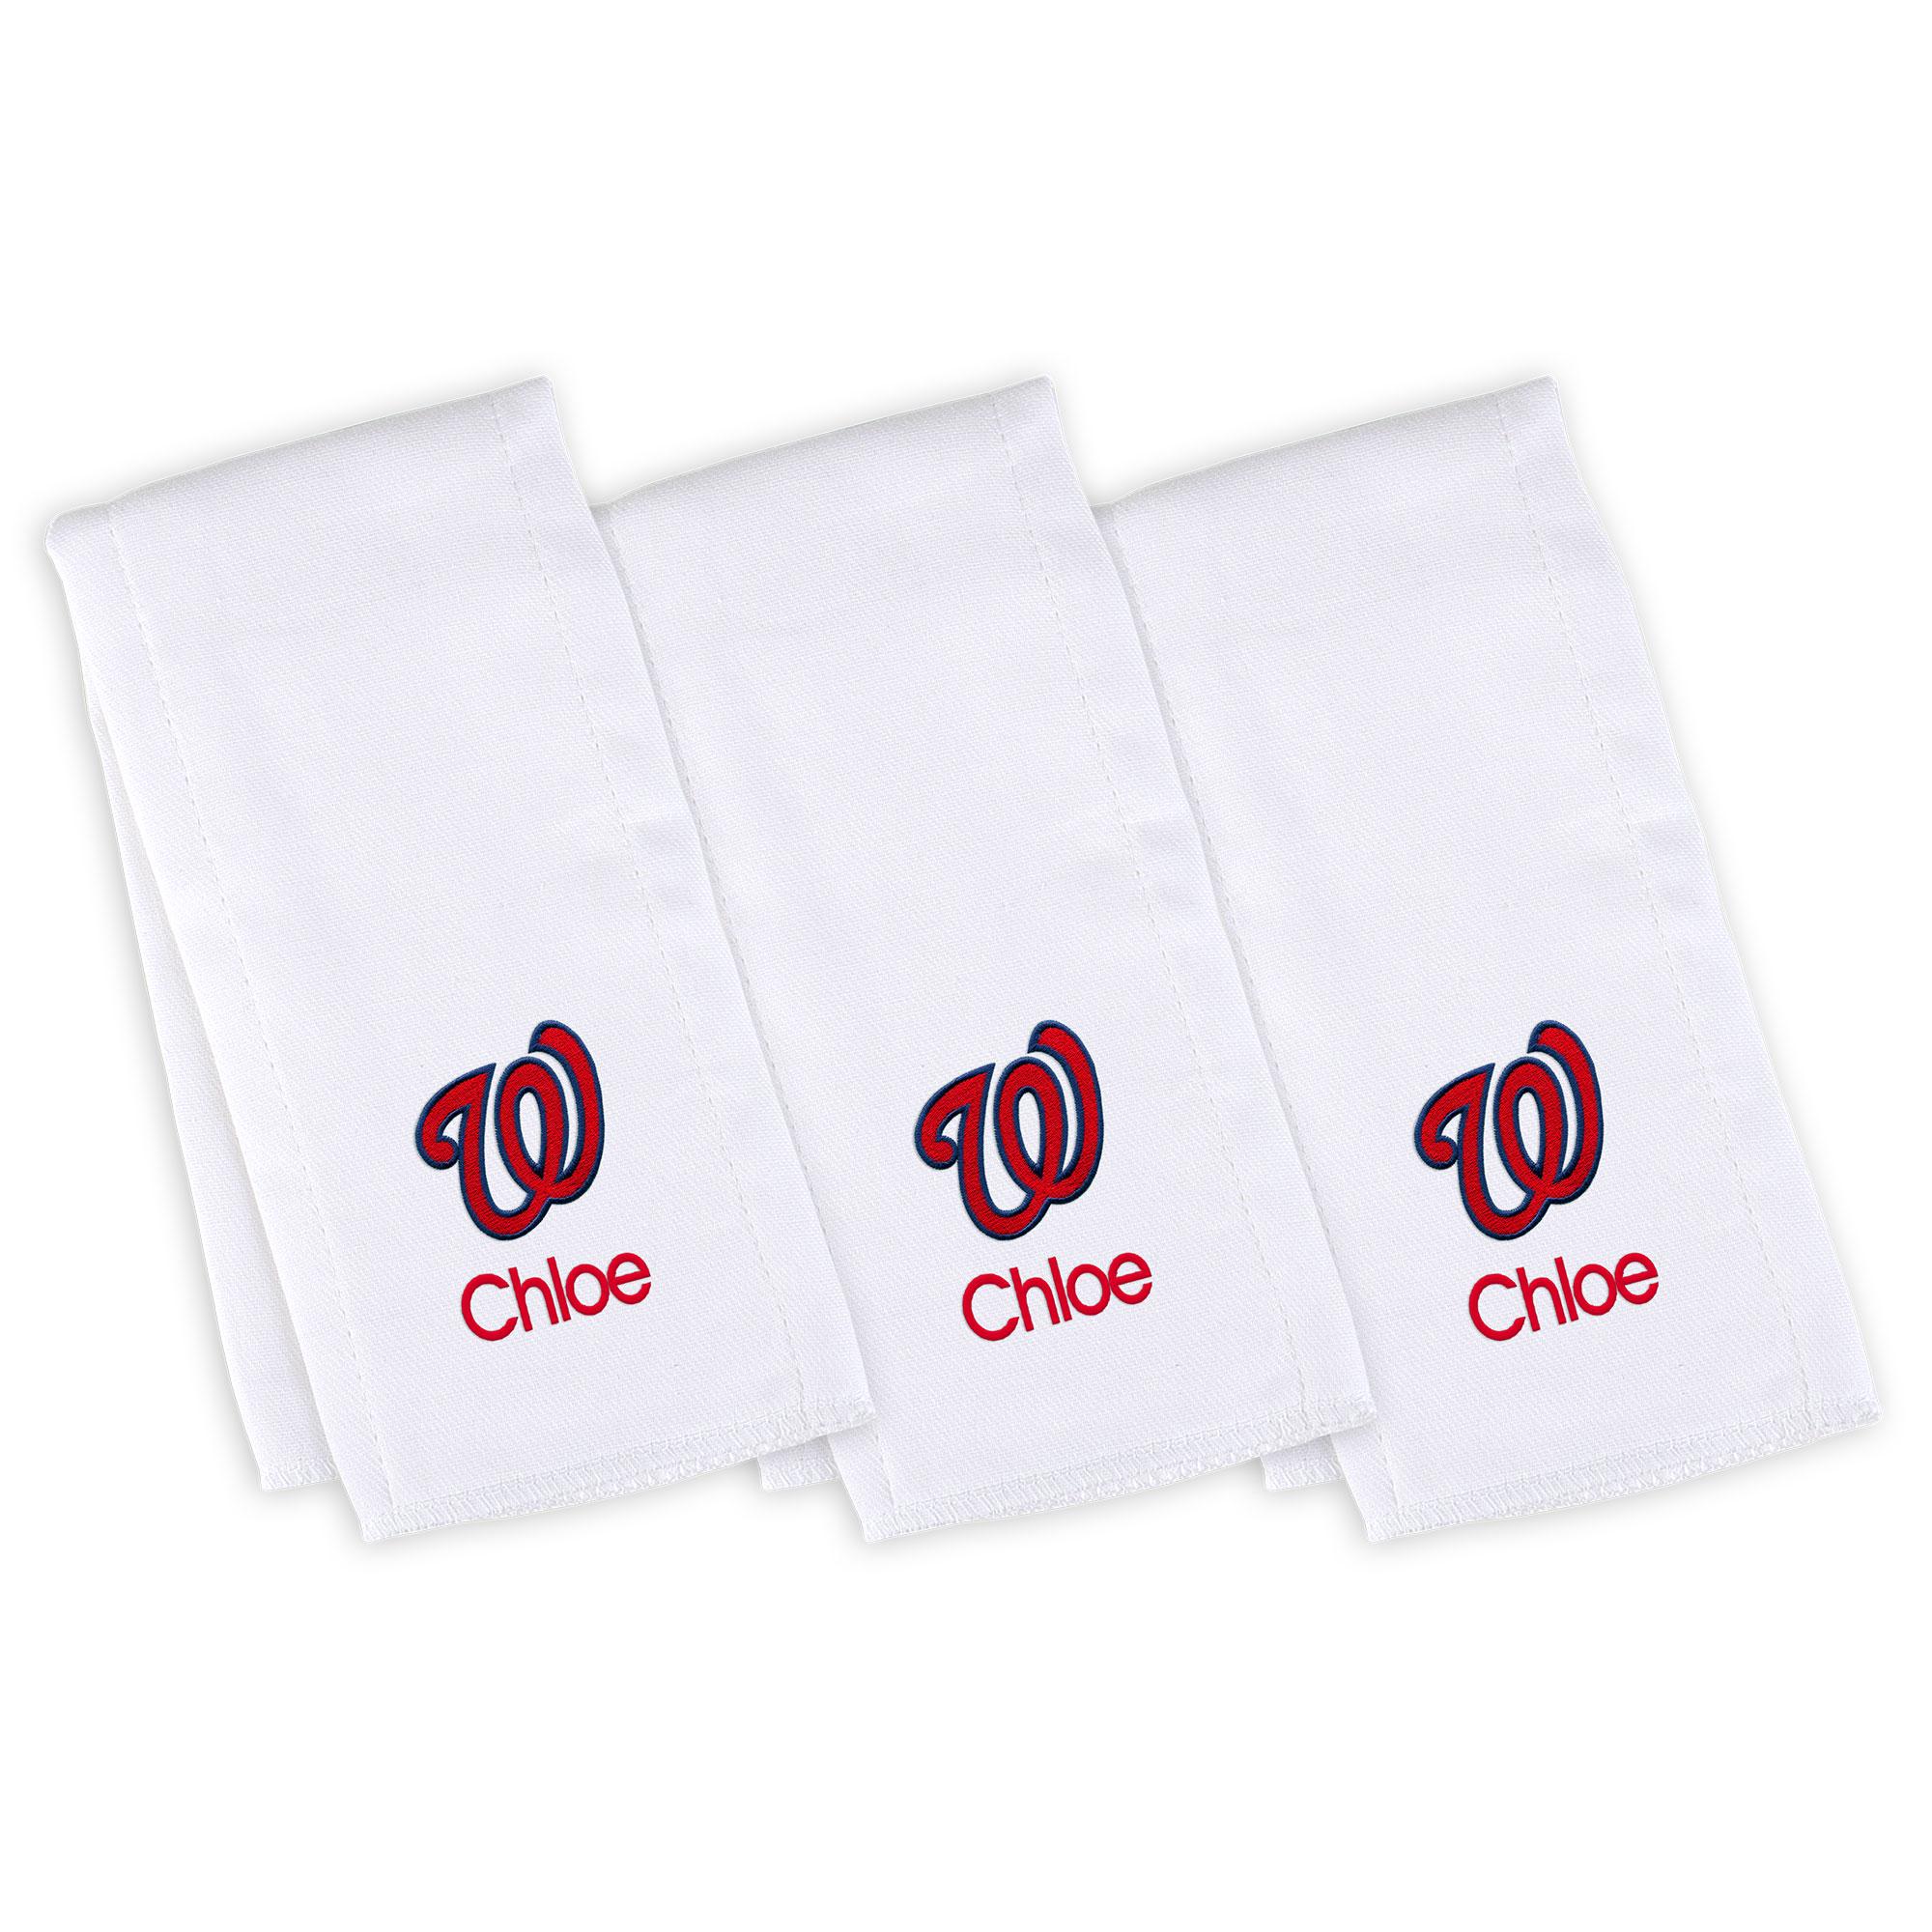 Washington Nationals Infant Personalized Burp Cloth 3-Pack - White